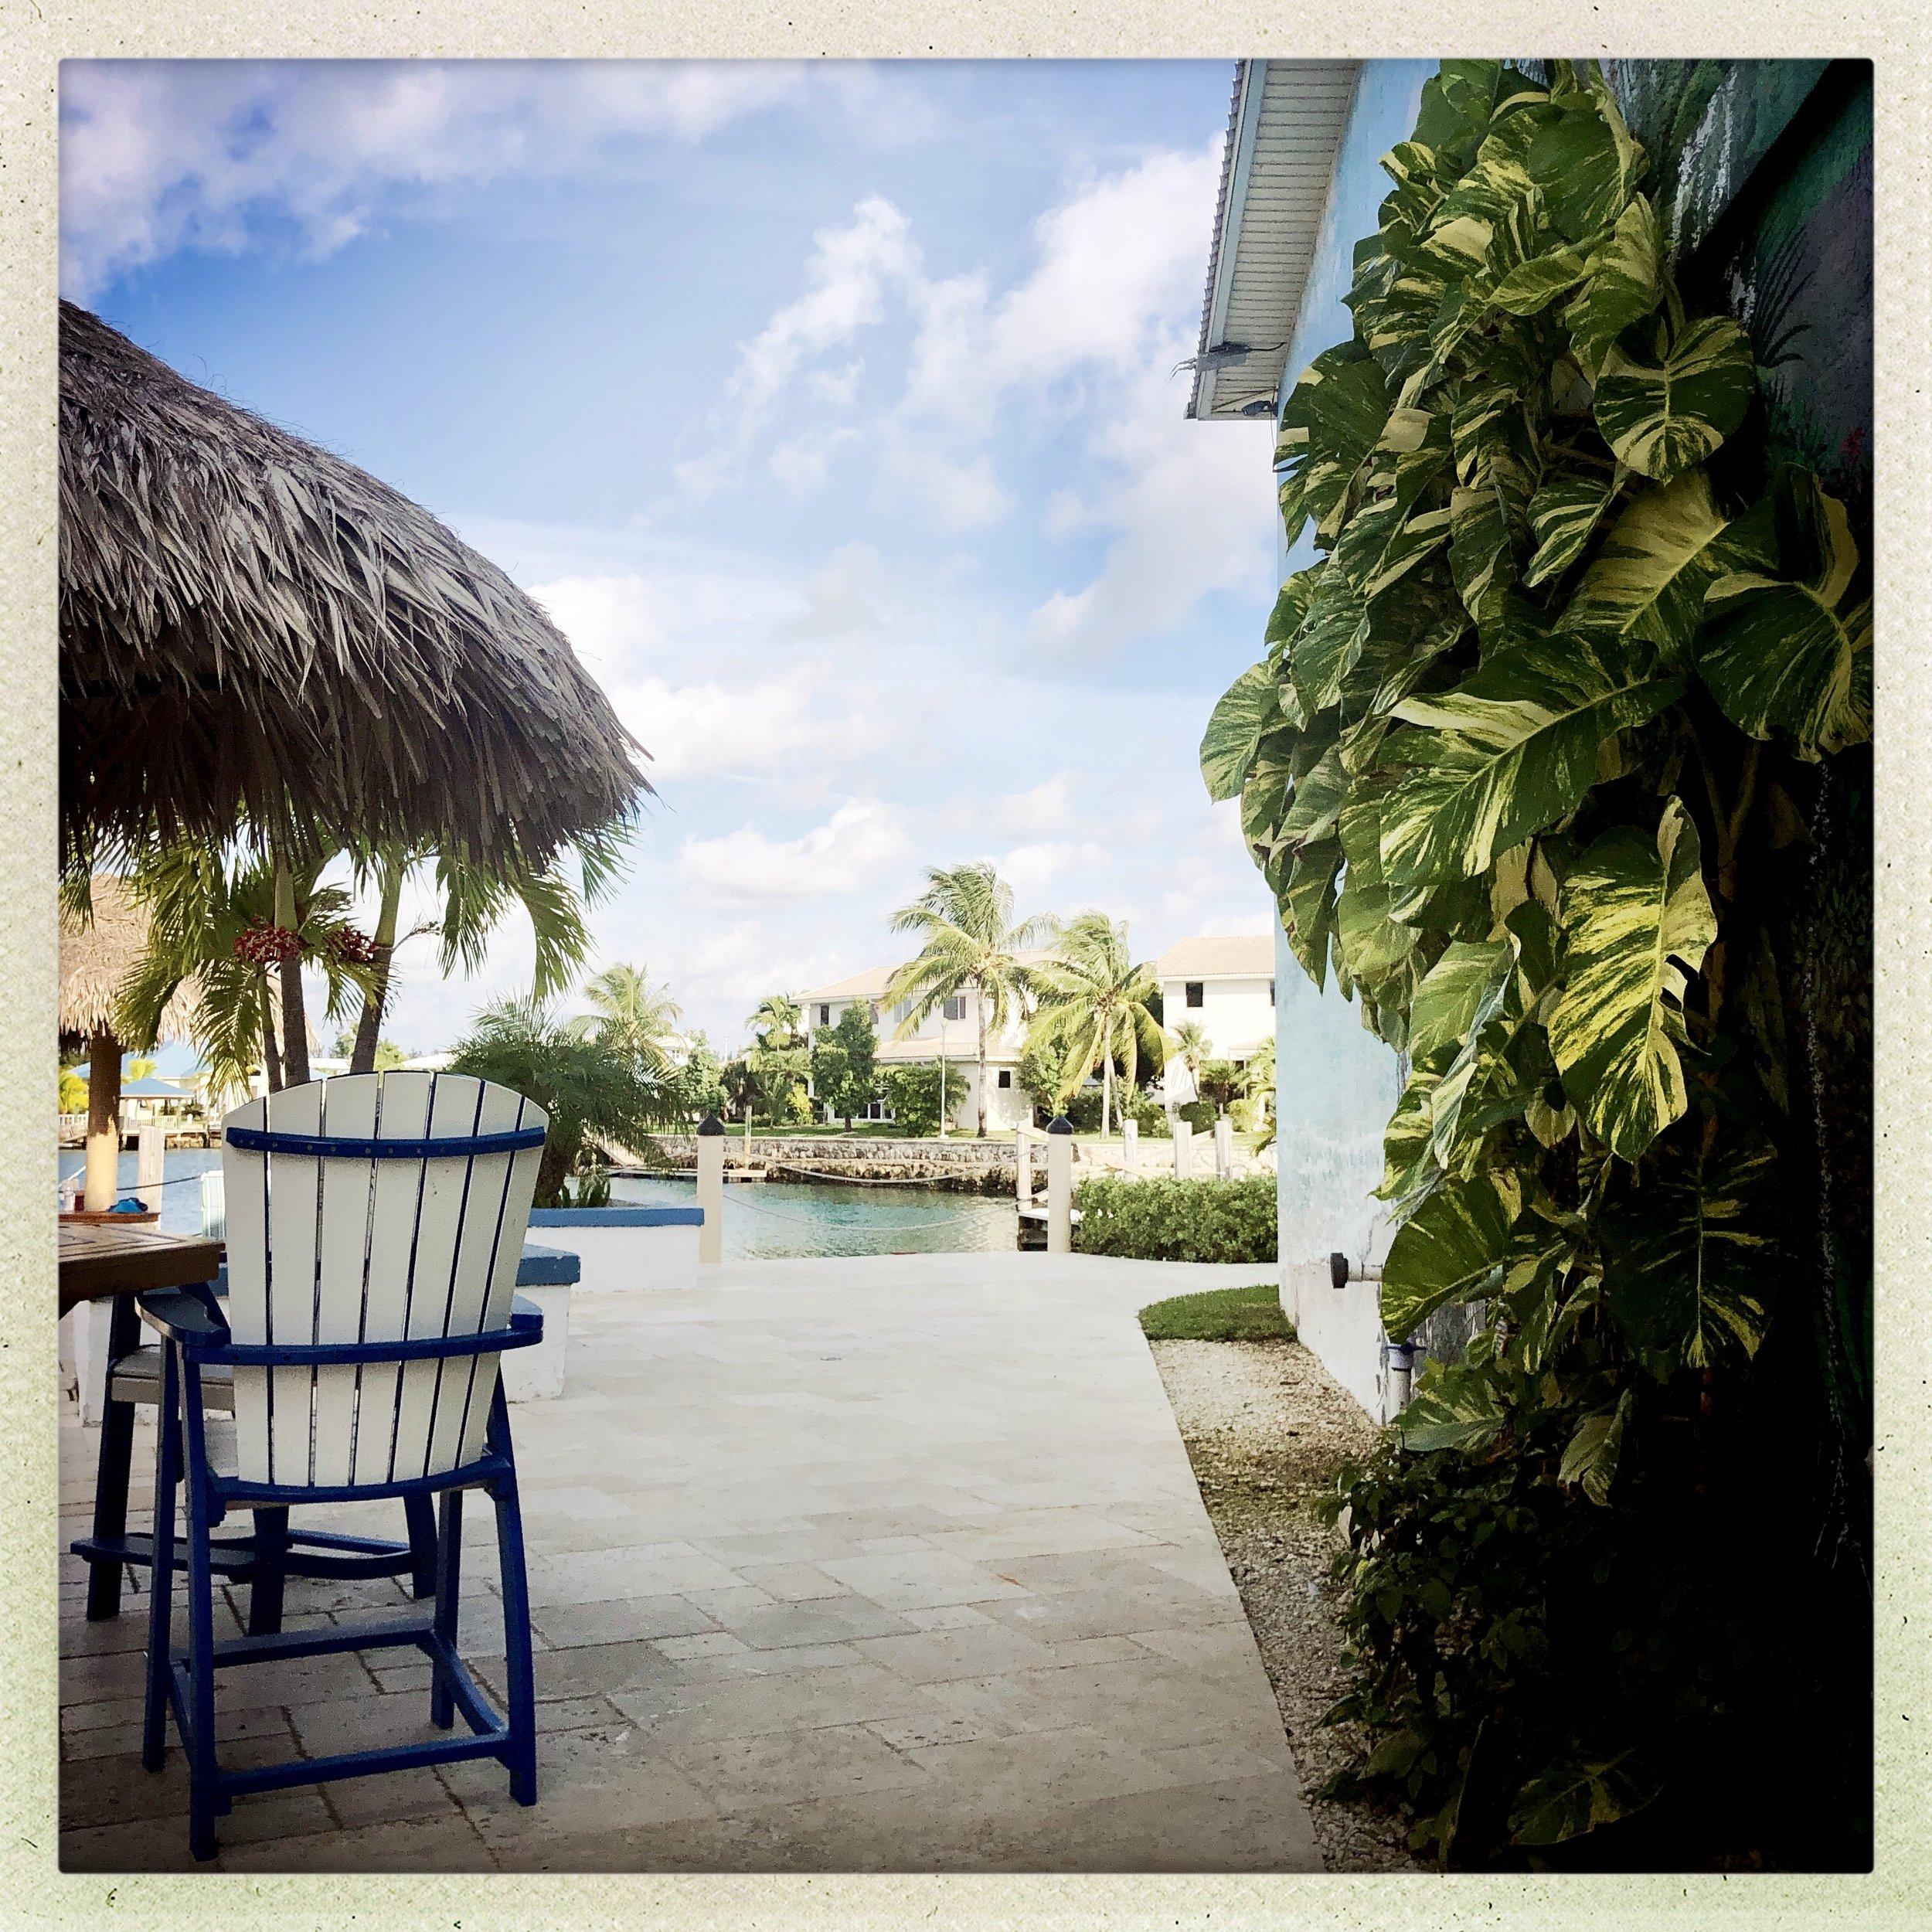 Ocean Reef Yacht Club & Resort on Grand Bahama Island